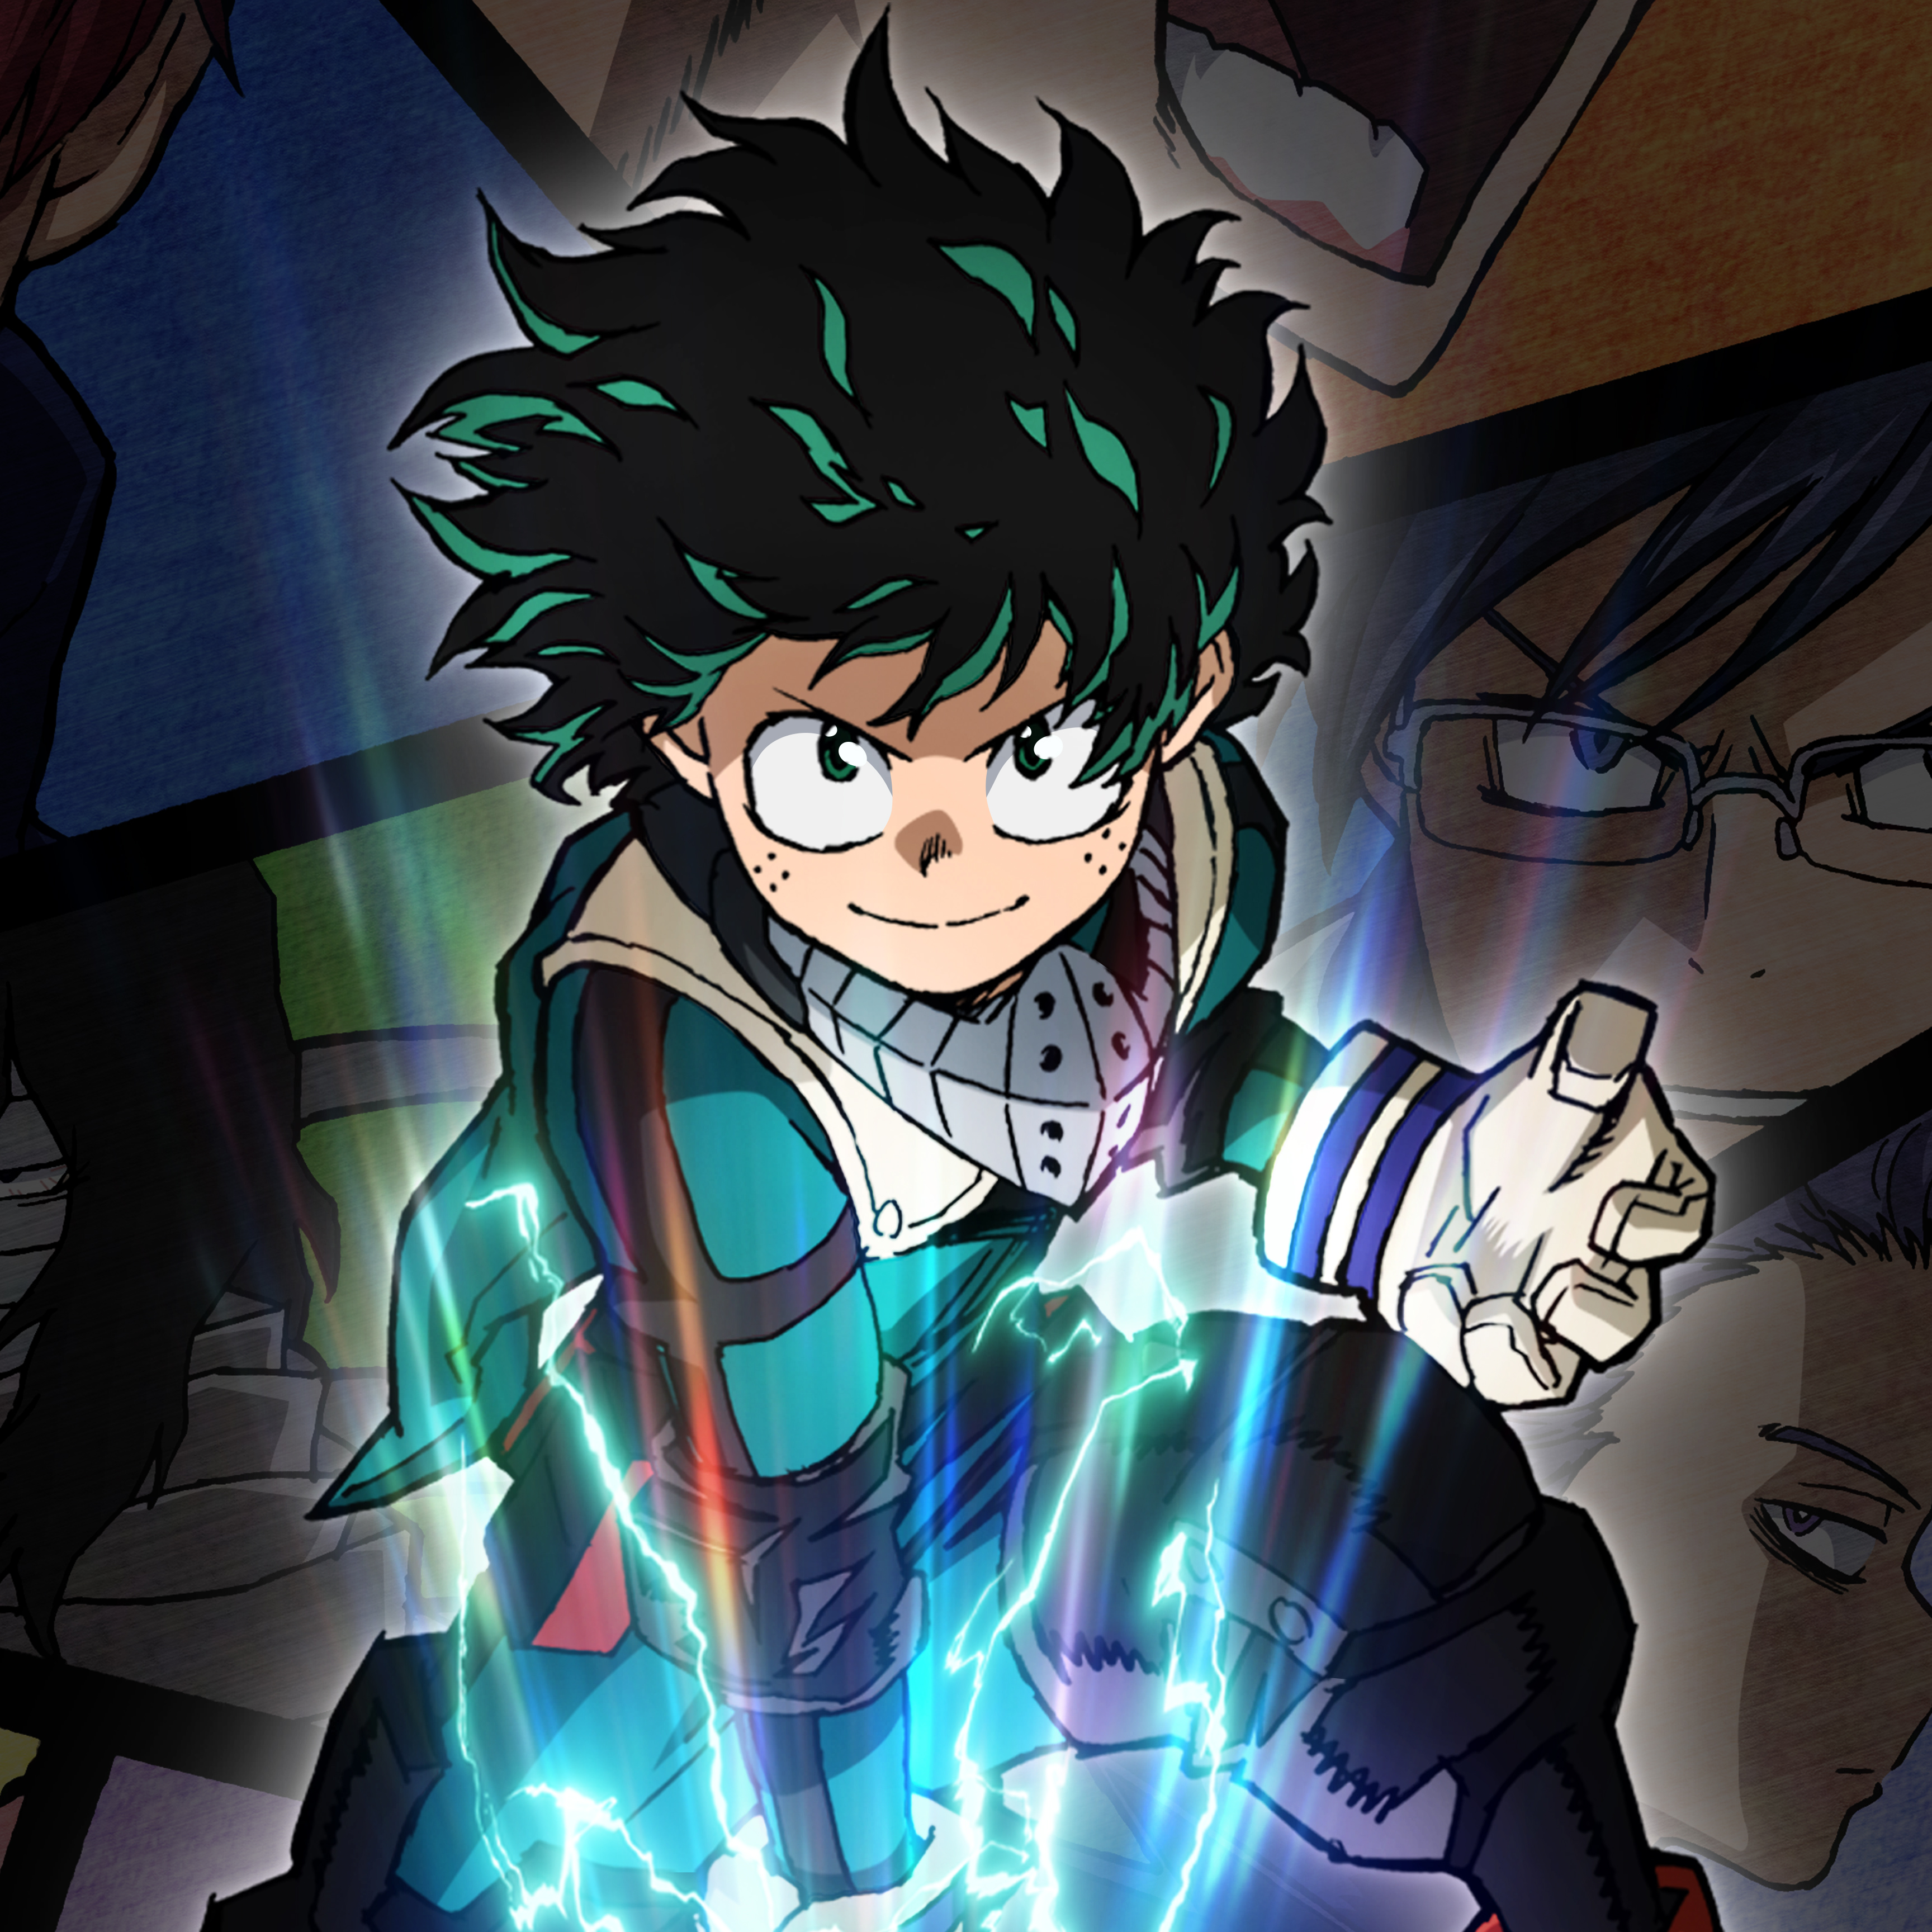 Watch My Hero Academia Episodes Sub & Dub | Action/Adventure